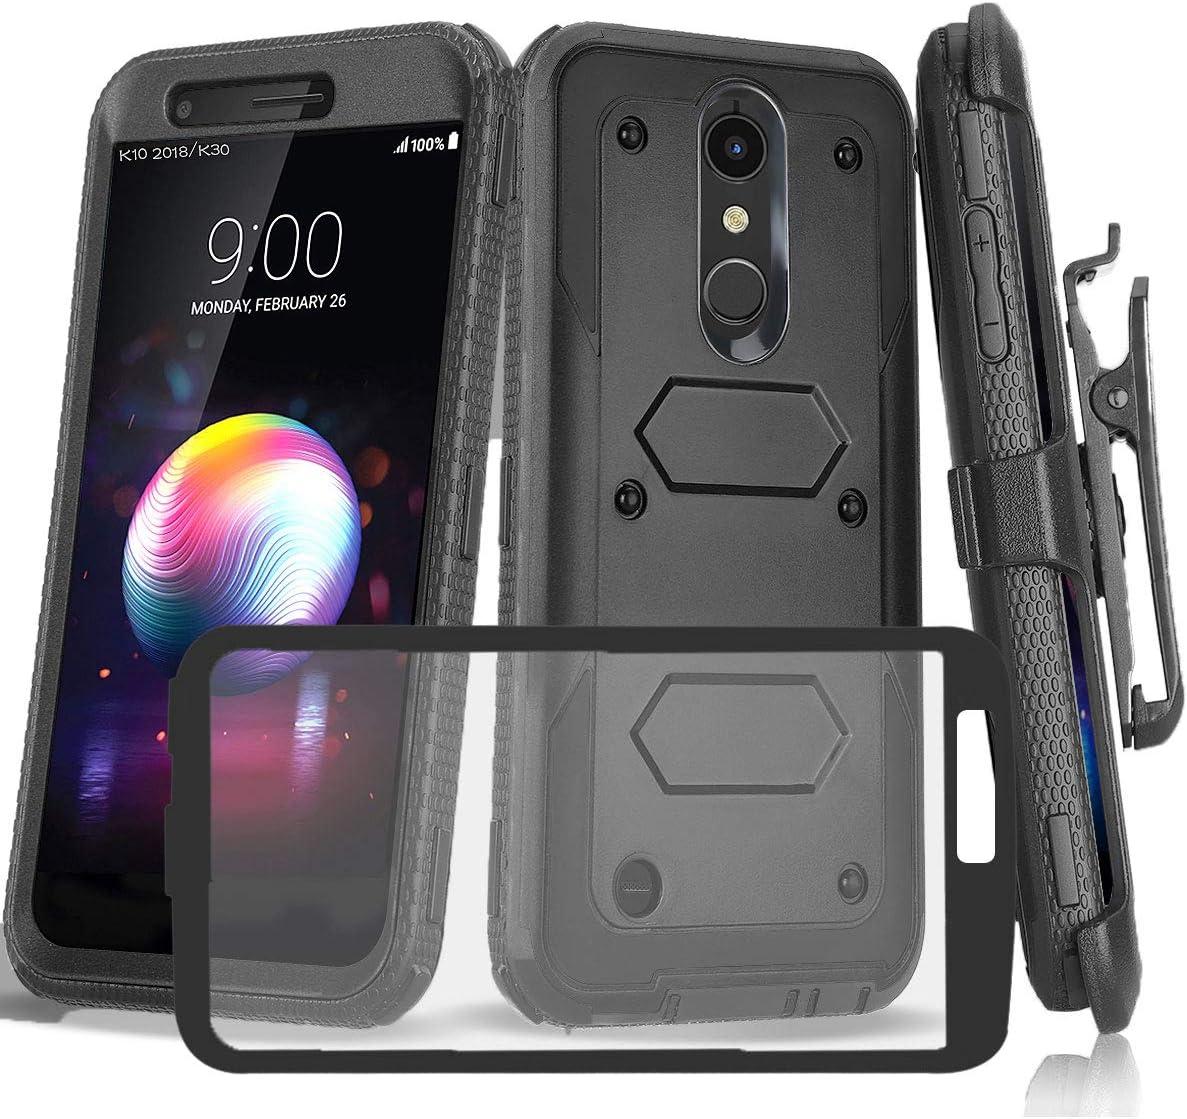 LG K30 Case/LG CV3 Prime/LG K10 2018/LG Phoenix Plus/Premier Pro LTE/LG Xpression Plus/Harmony 2 Case W [Built-in Screen Protector] Heavy Duty Rugged Armor Swivel Belt Clip Holster[Kickstand], Black